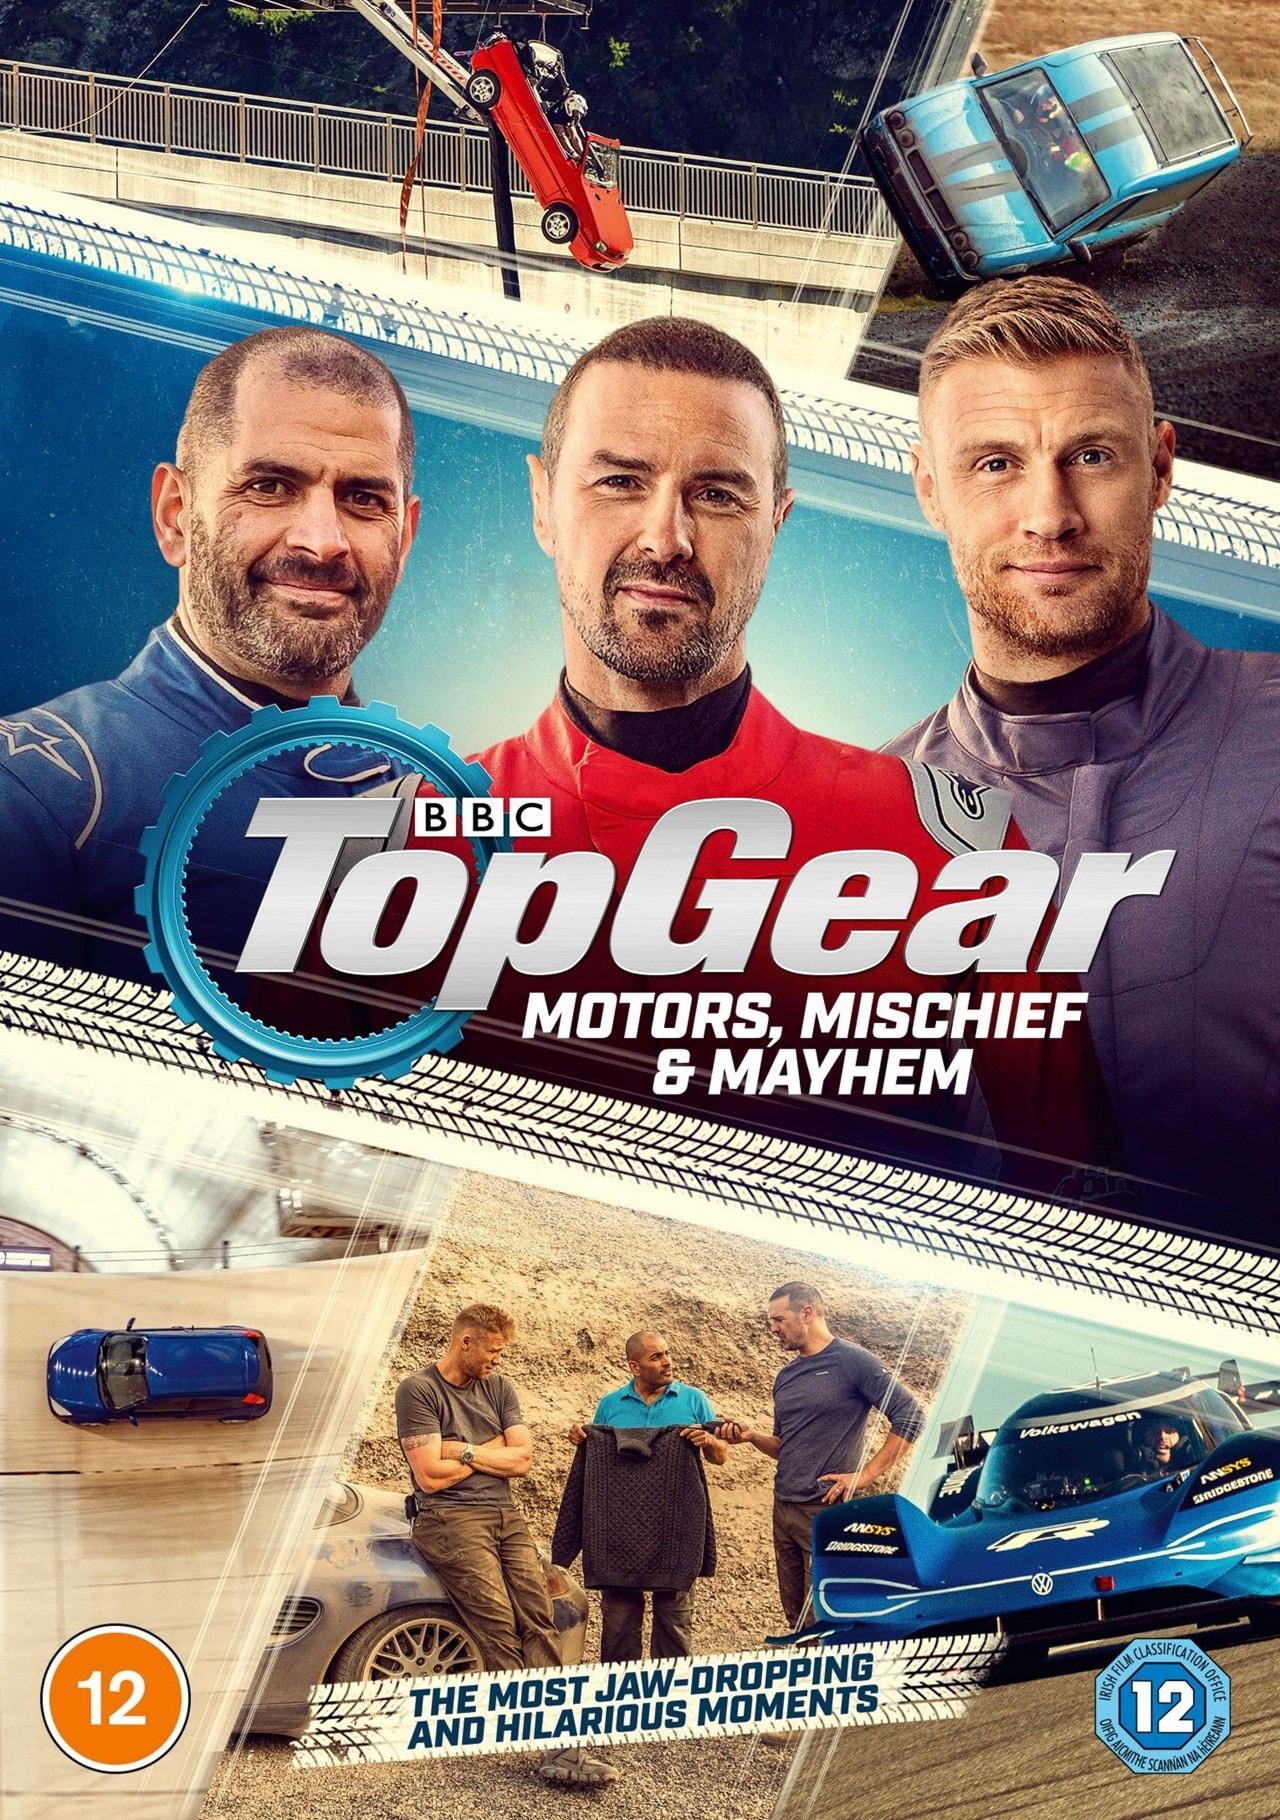 Top Gear: Motors, Mischief & Mayhem - 1